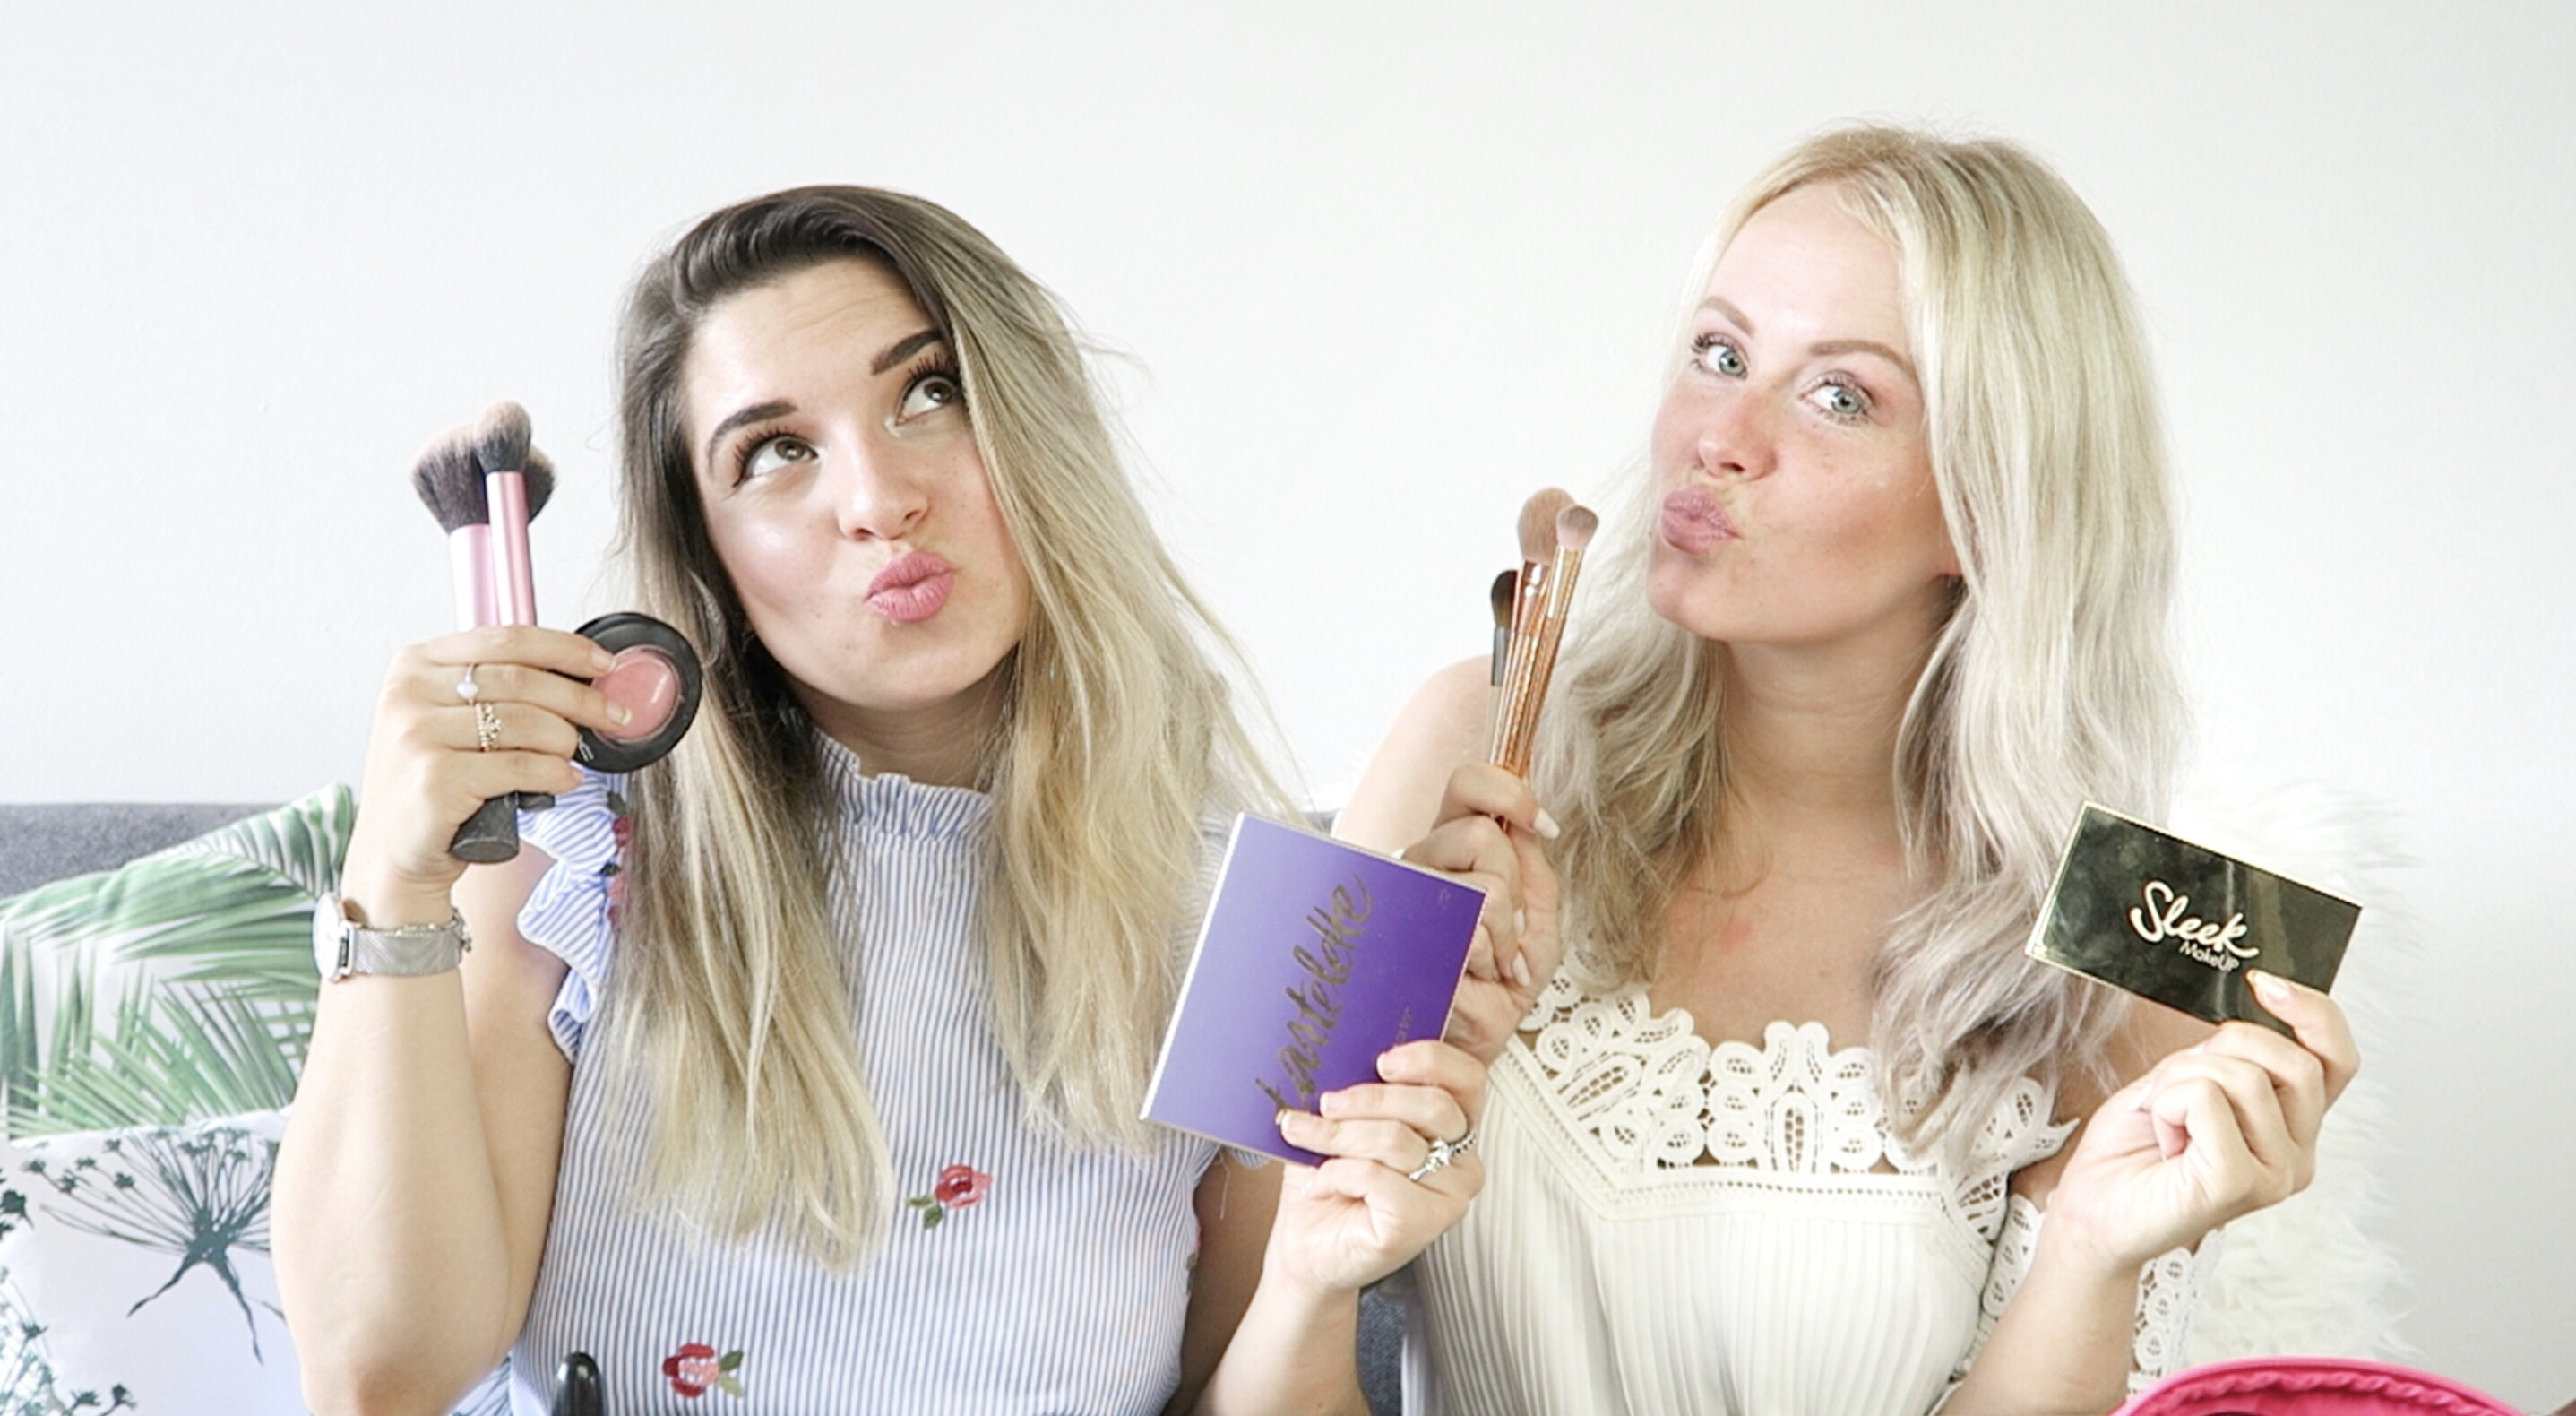 Dagelijkse make-up routine | Get ready with us!